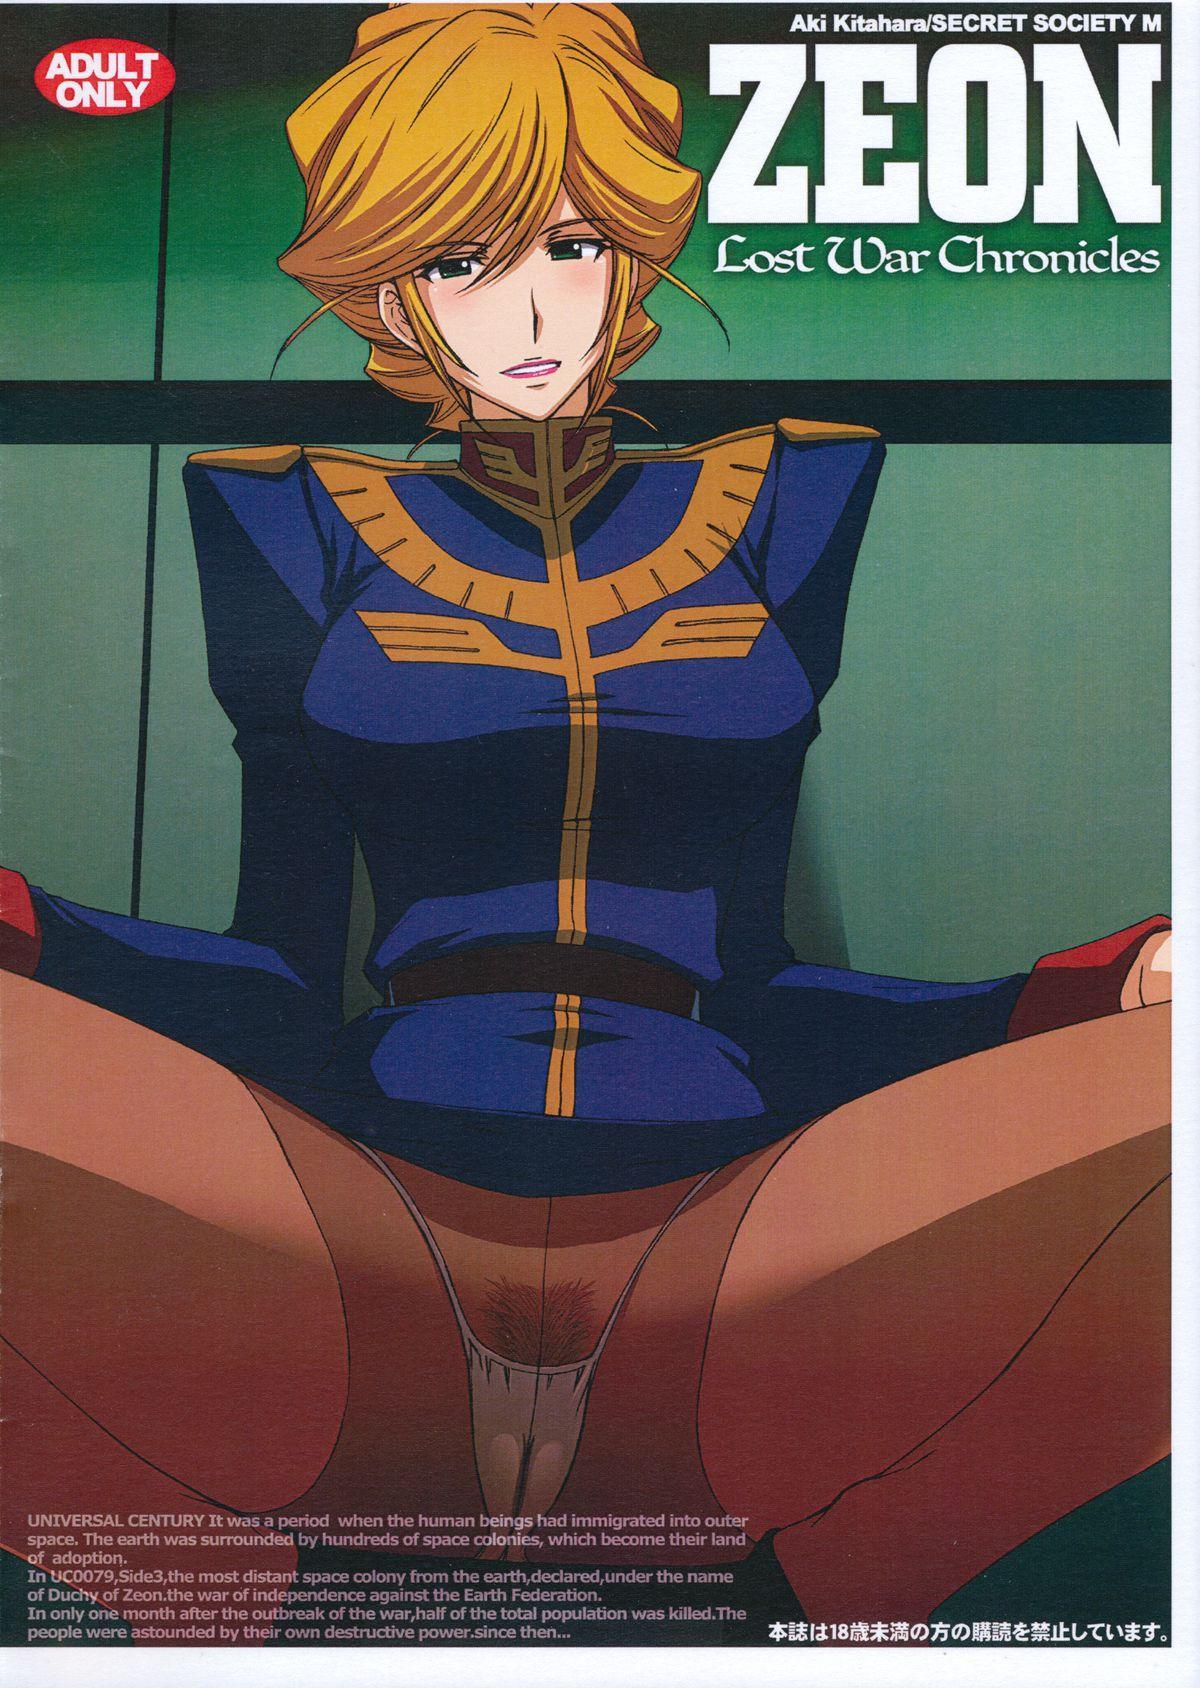 ZEON Lost War Chronicles - Gaiden no Daigyakushuu 1